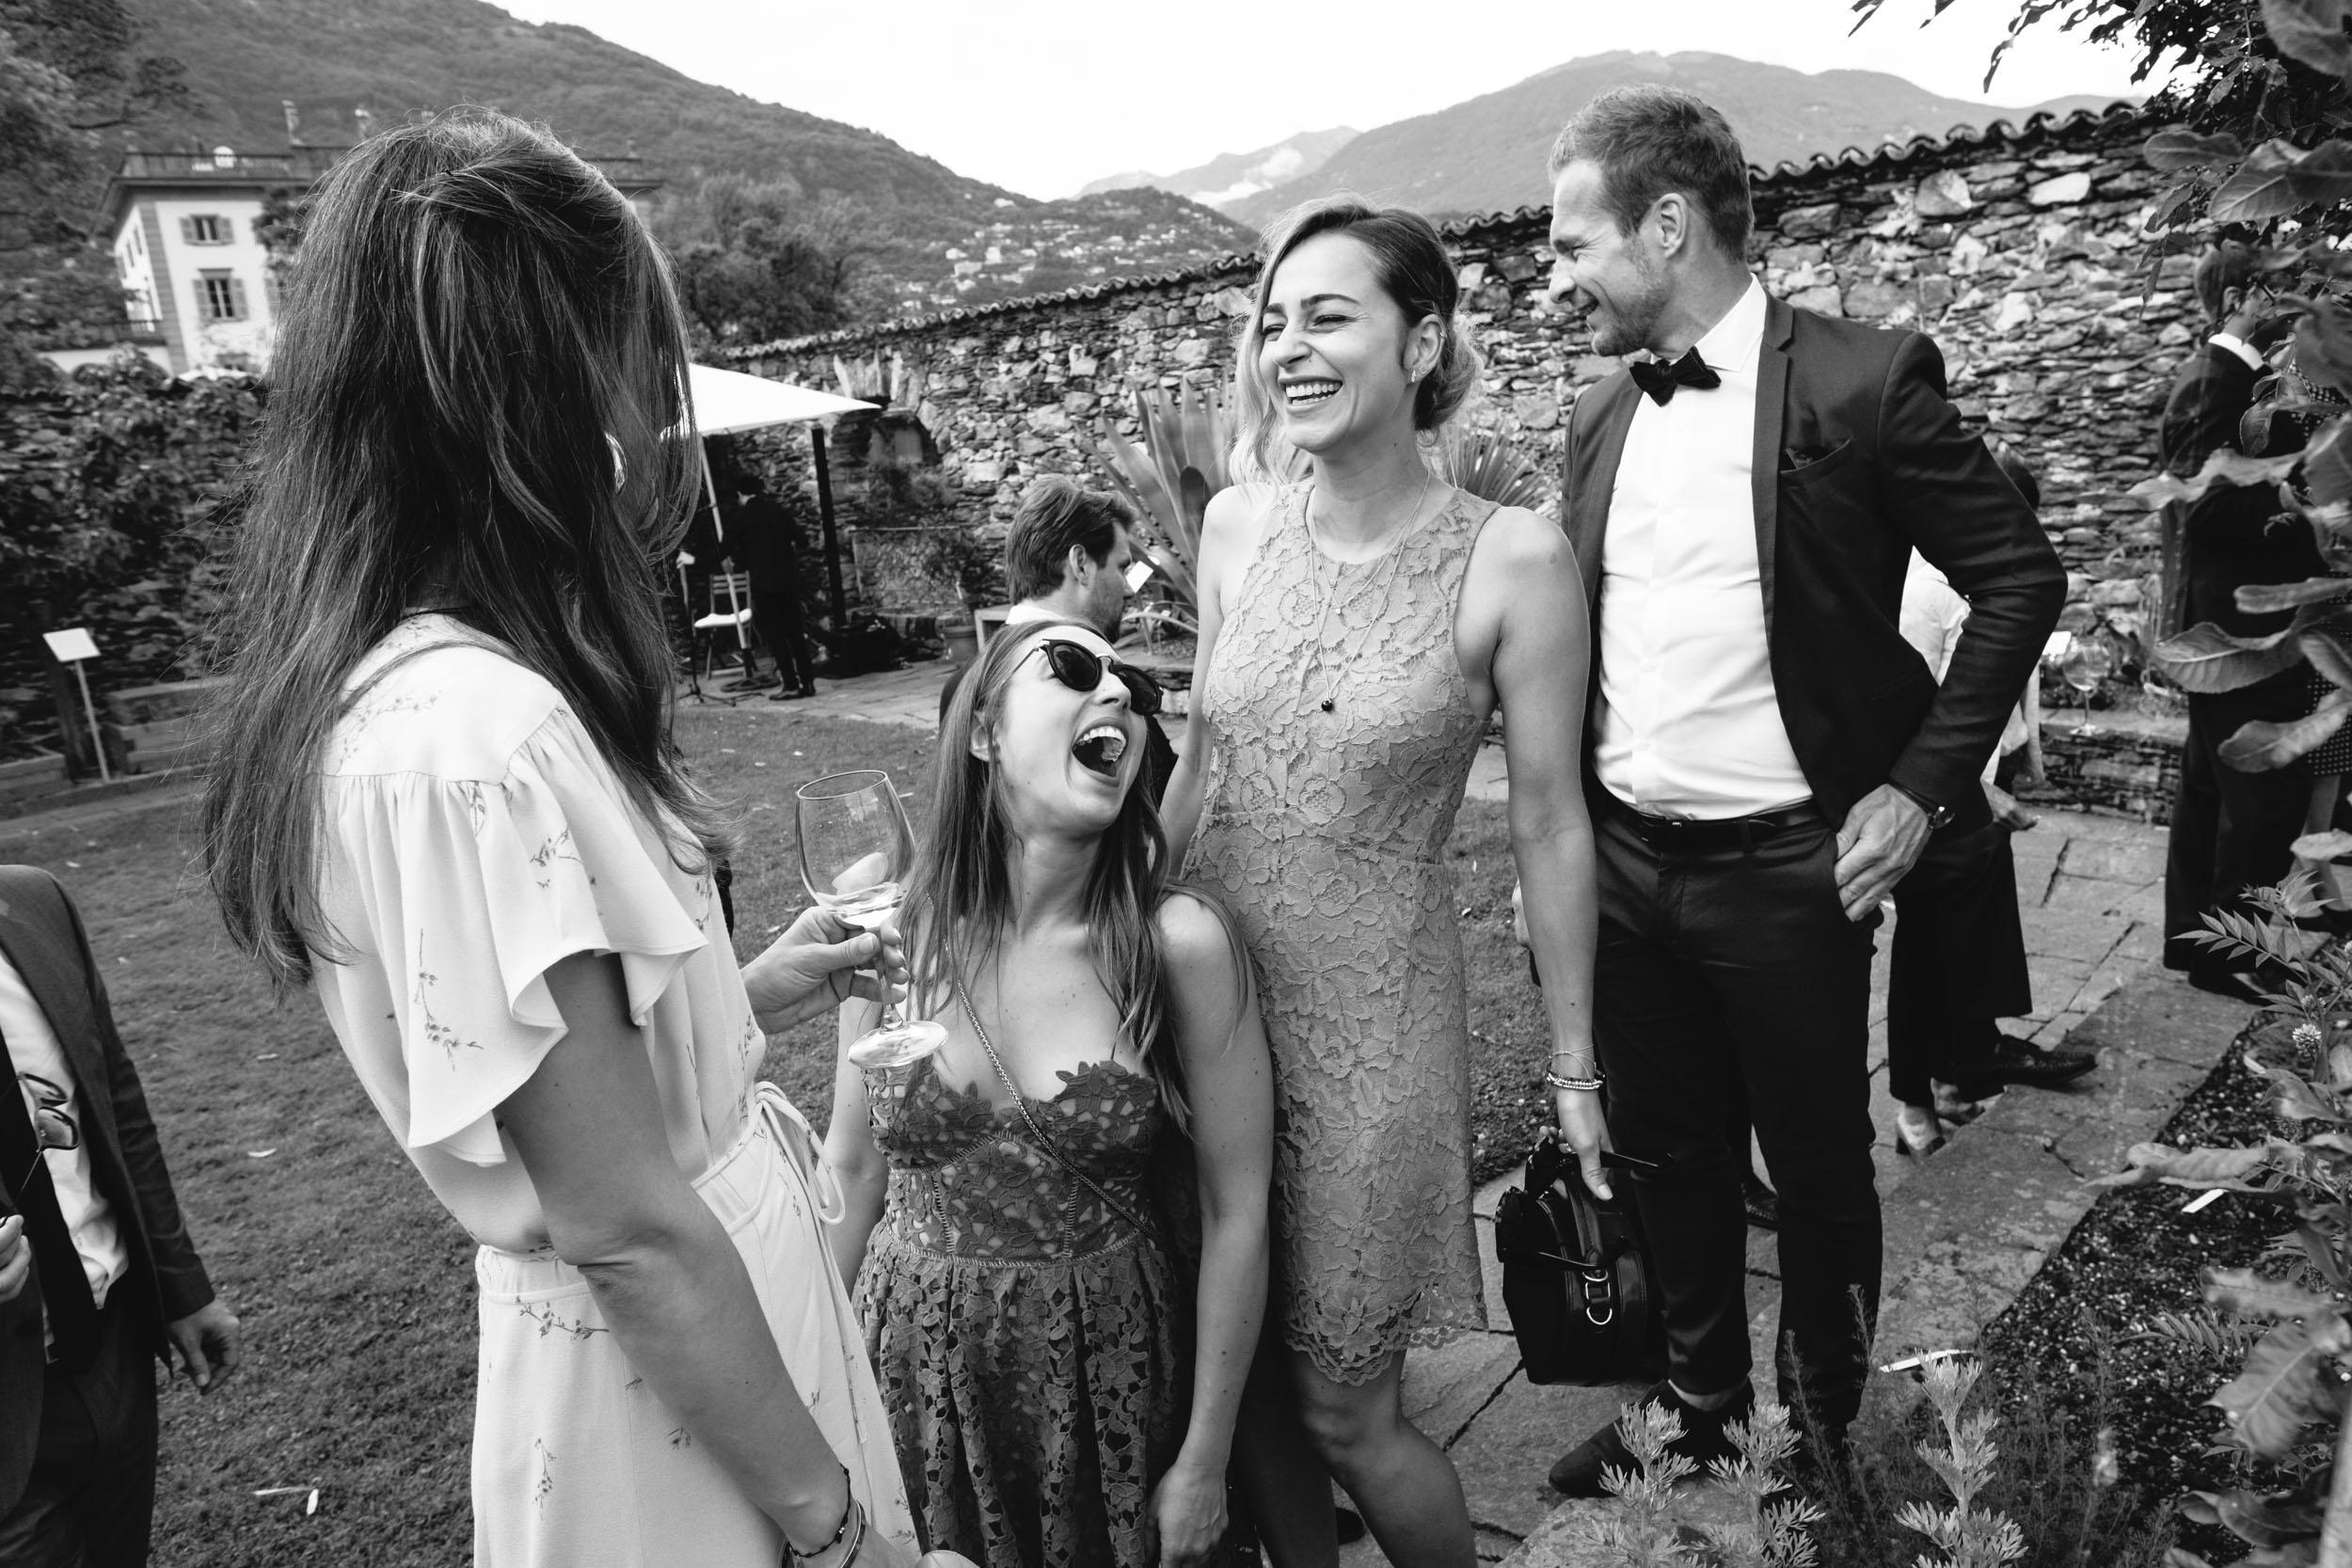 olivia-andreas-wedding-switzerland-374.jpg